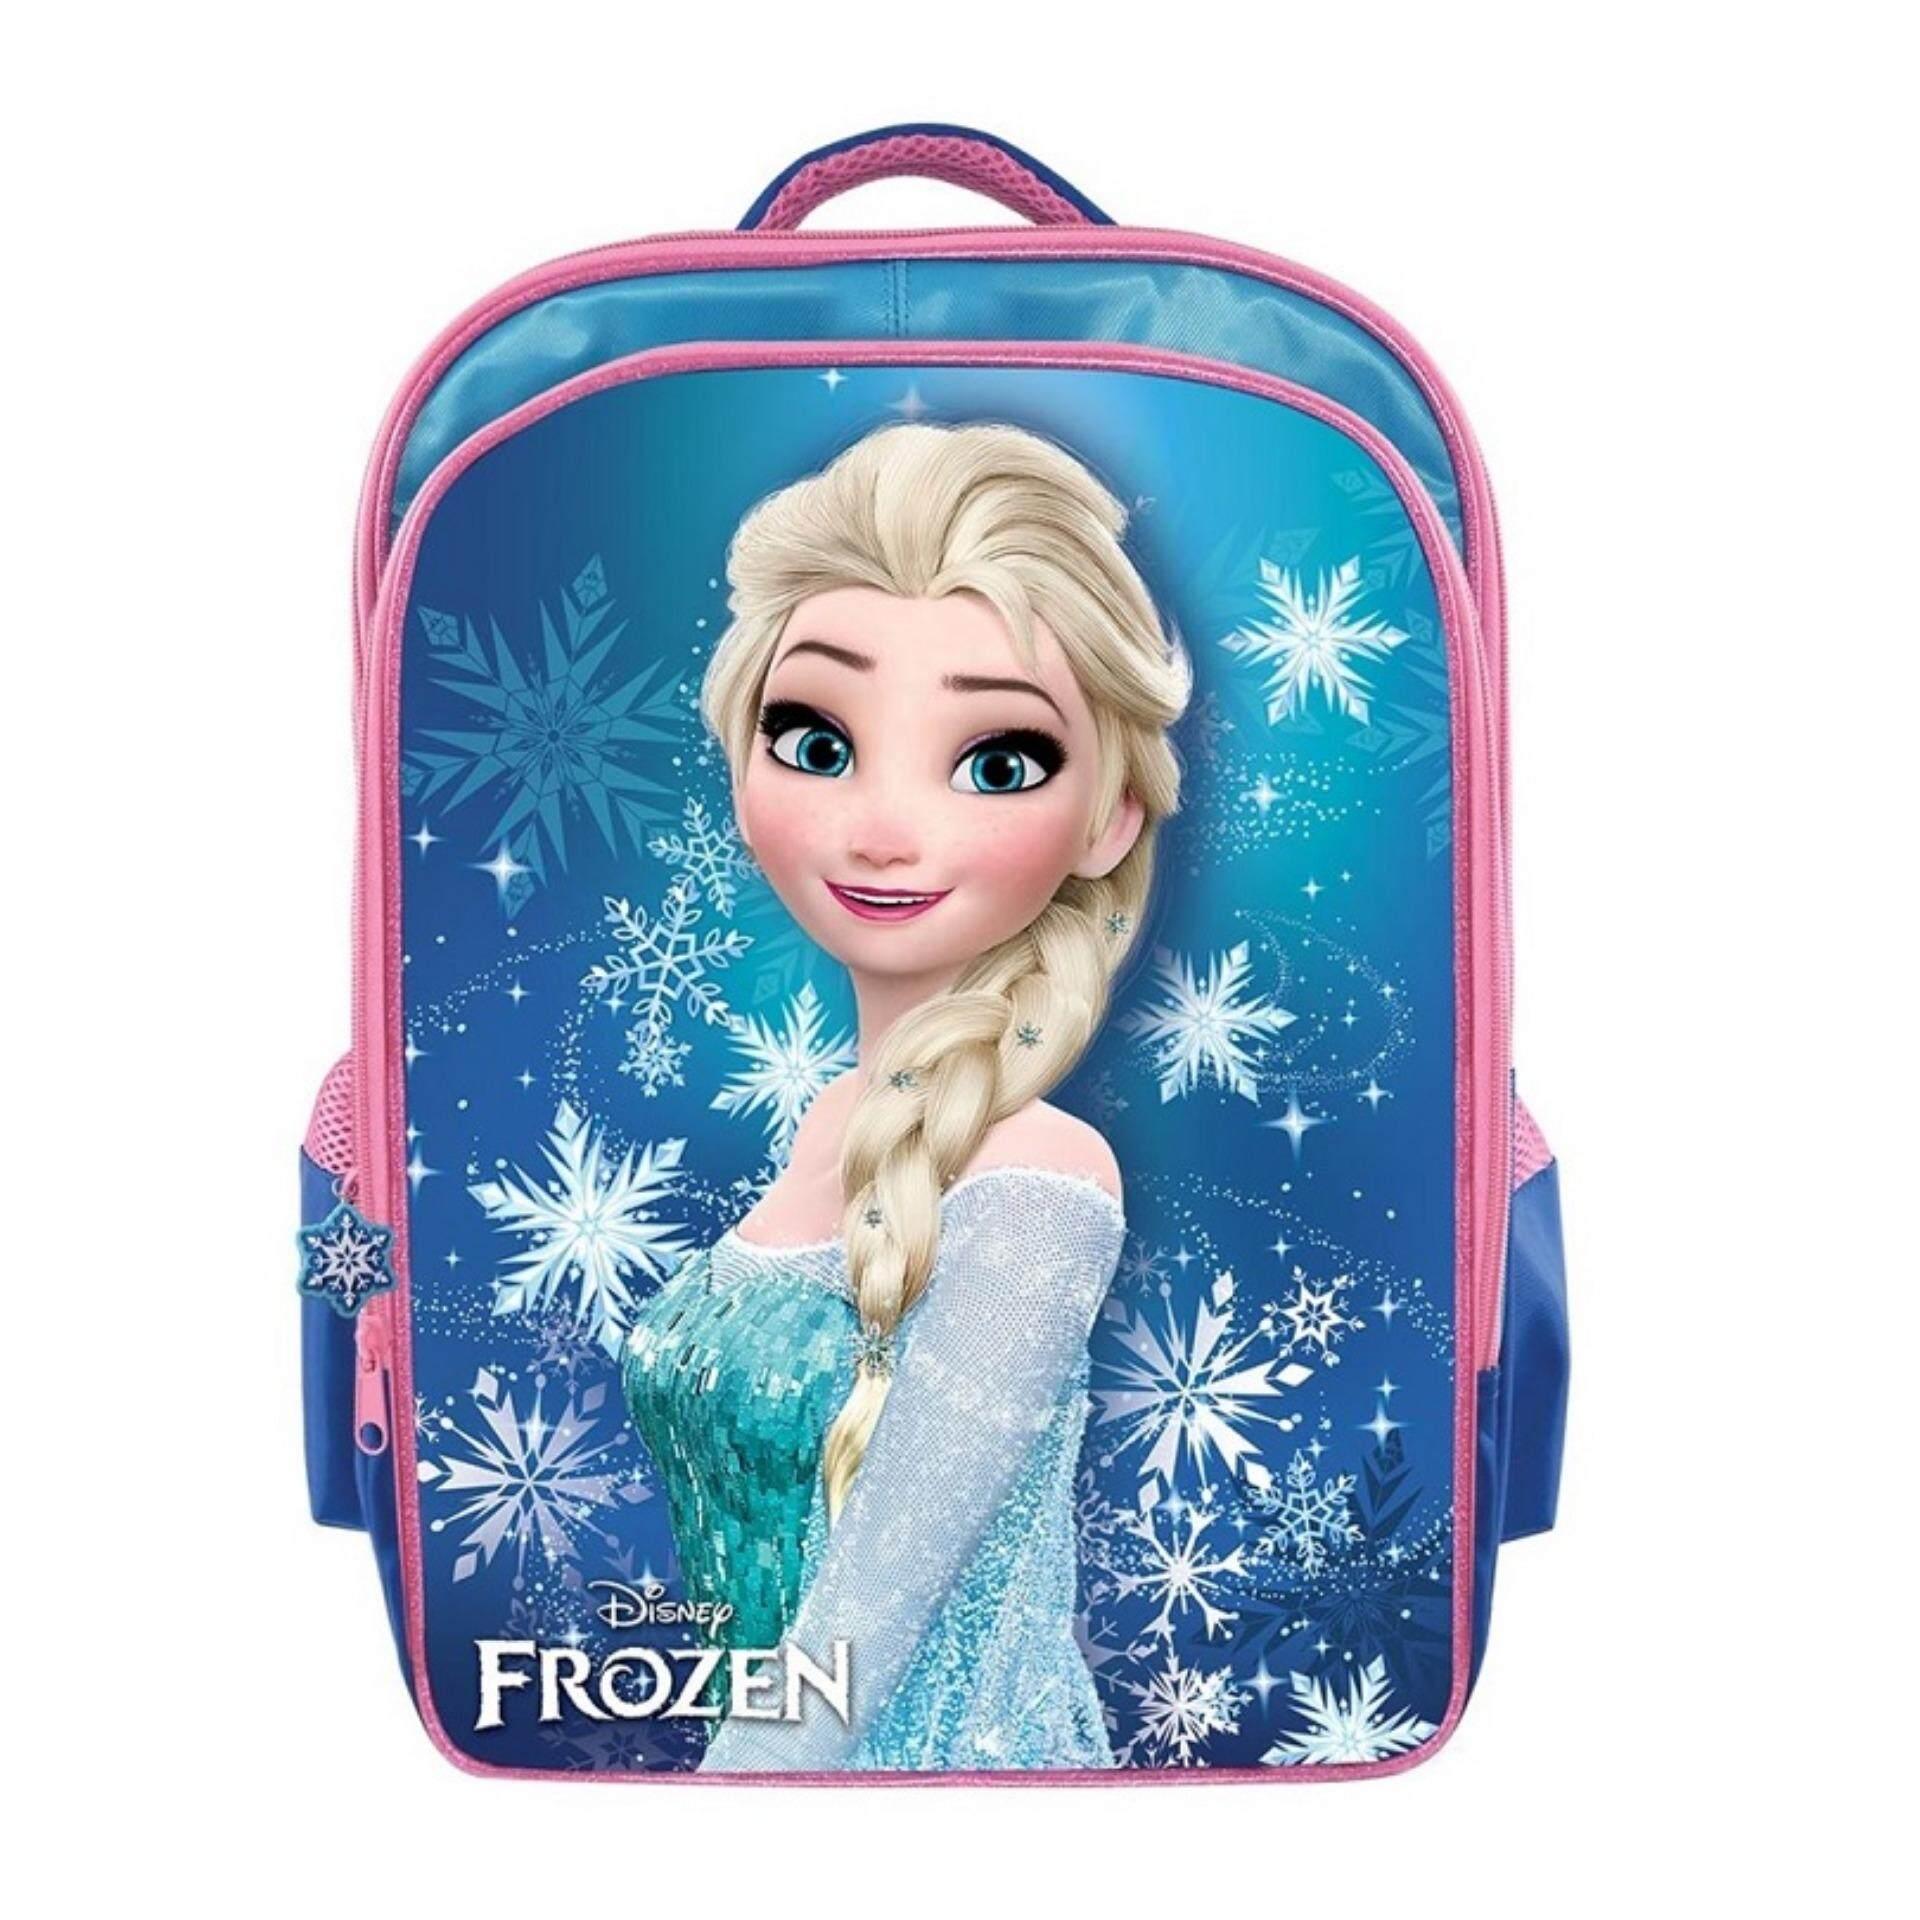 Disney Princess Frozen Primary School Bag Backpack - Elsa